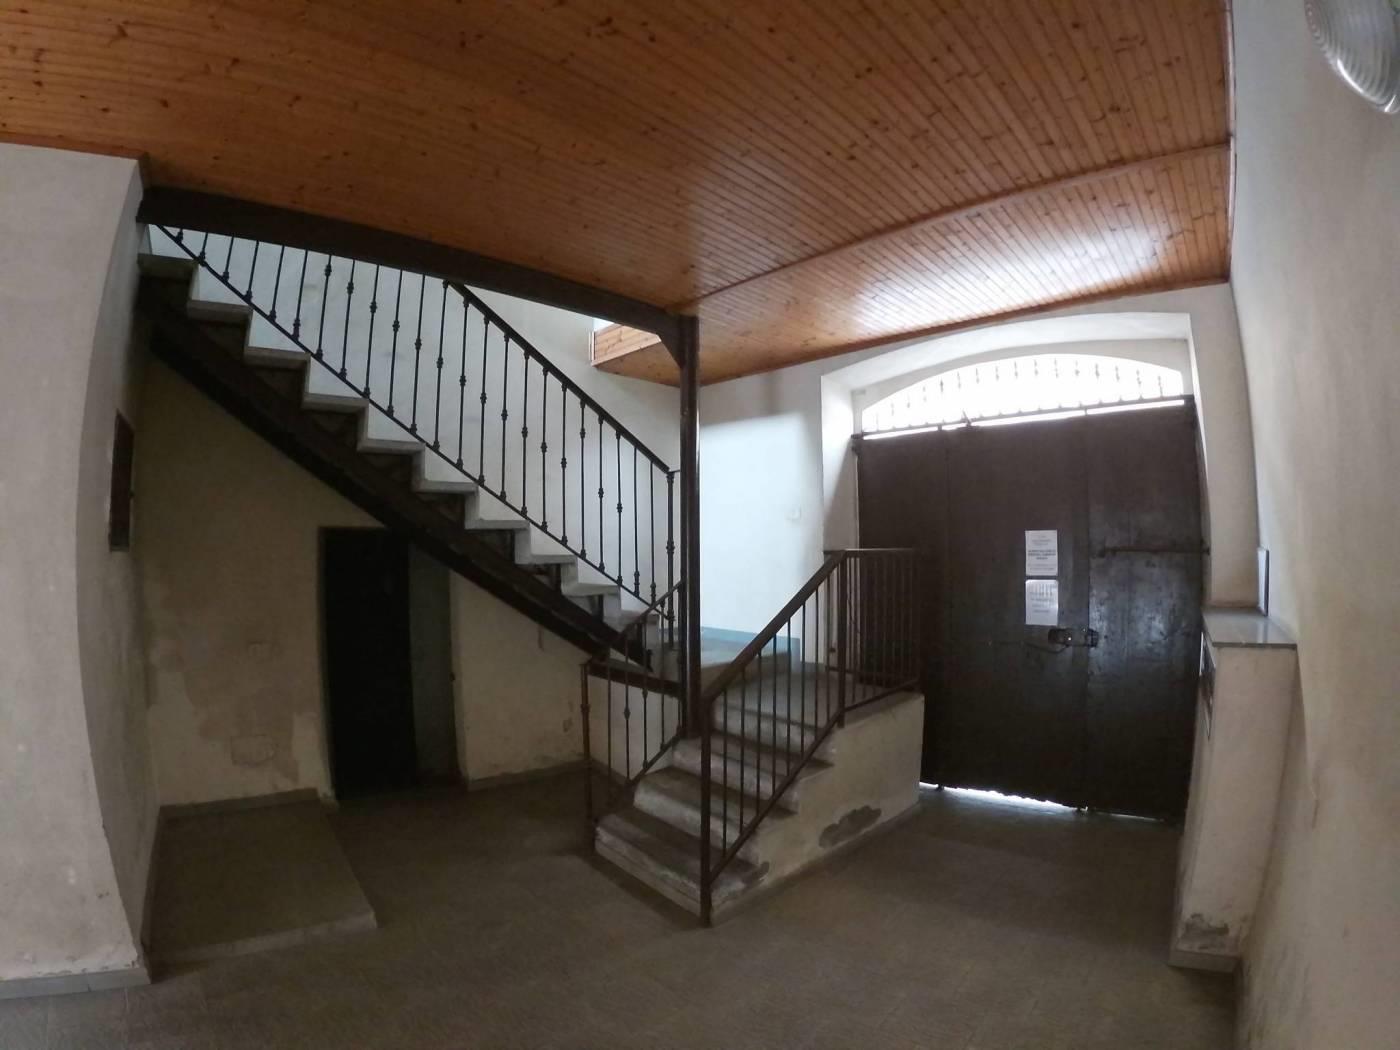 Foto 3 - Appartamento in Vendita - Alserio (Como)